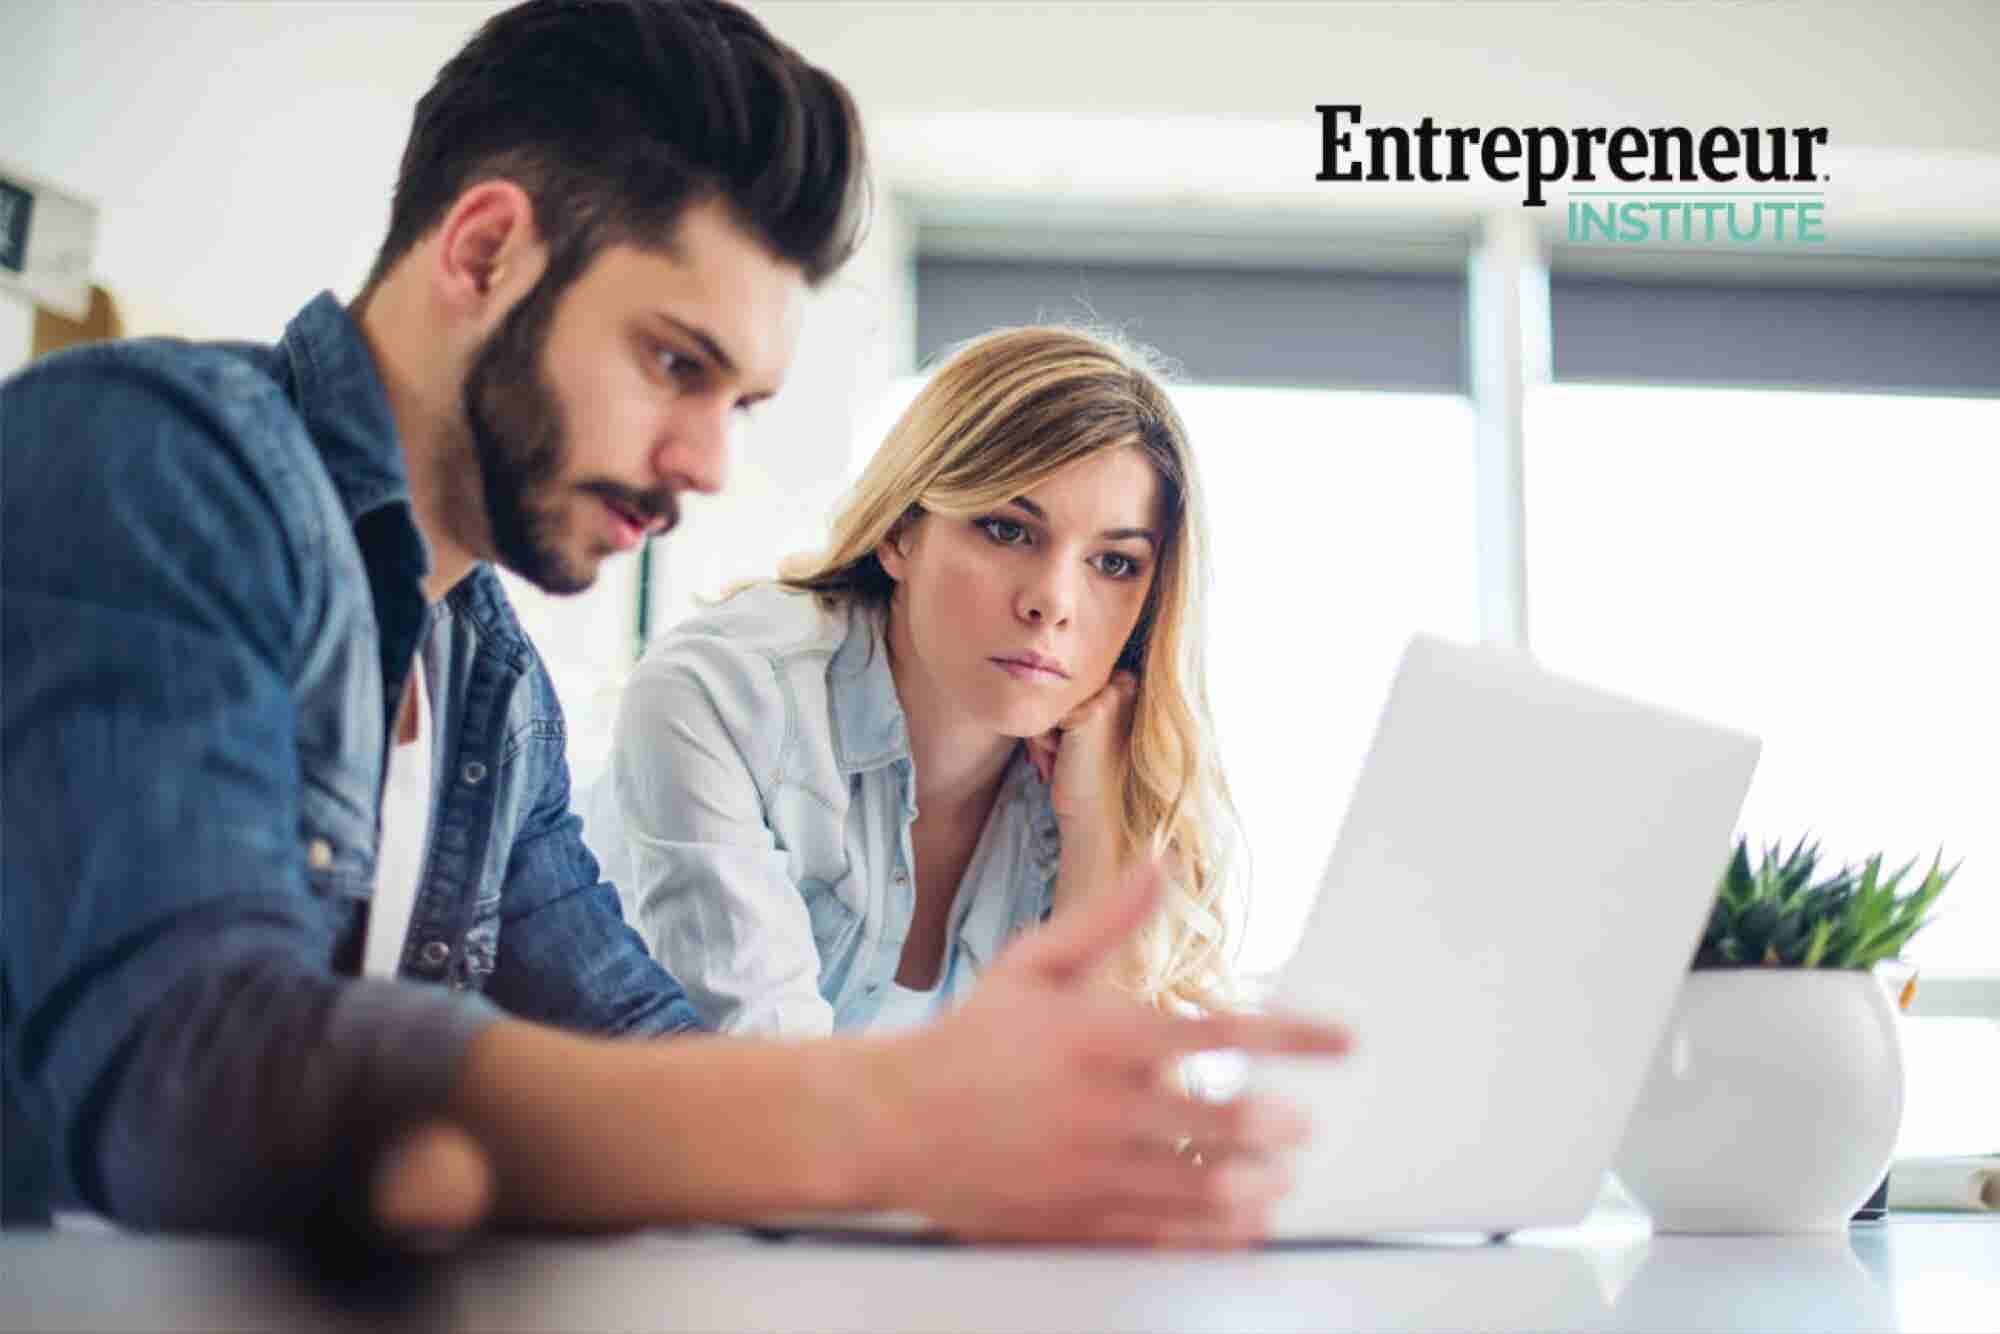 ¡Este diplomado para emprendedores 100% en línea es para ti!